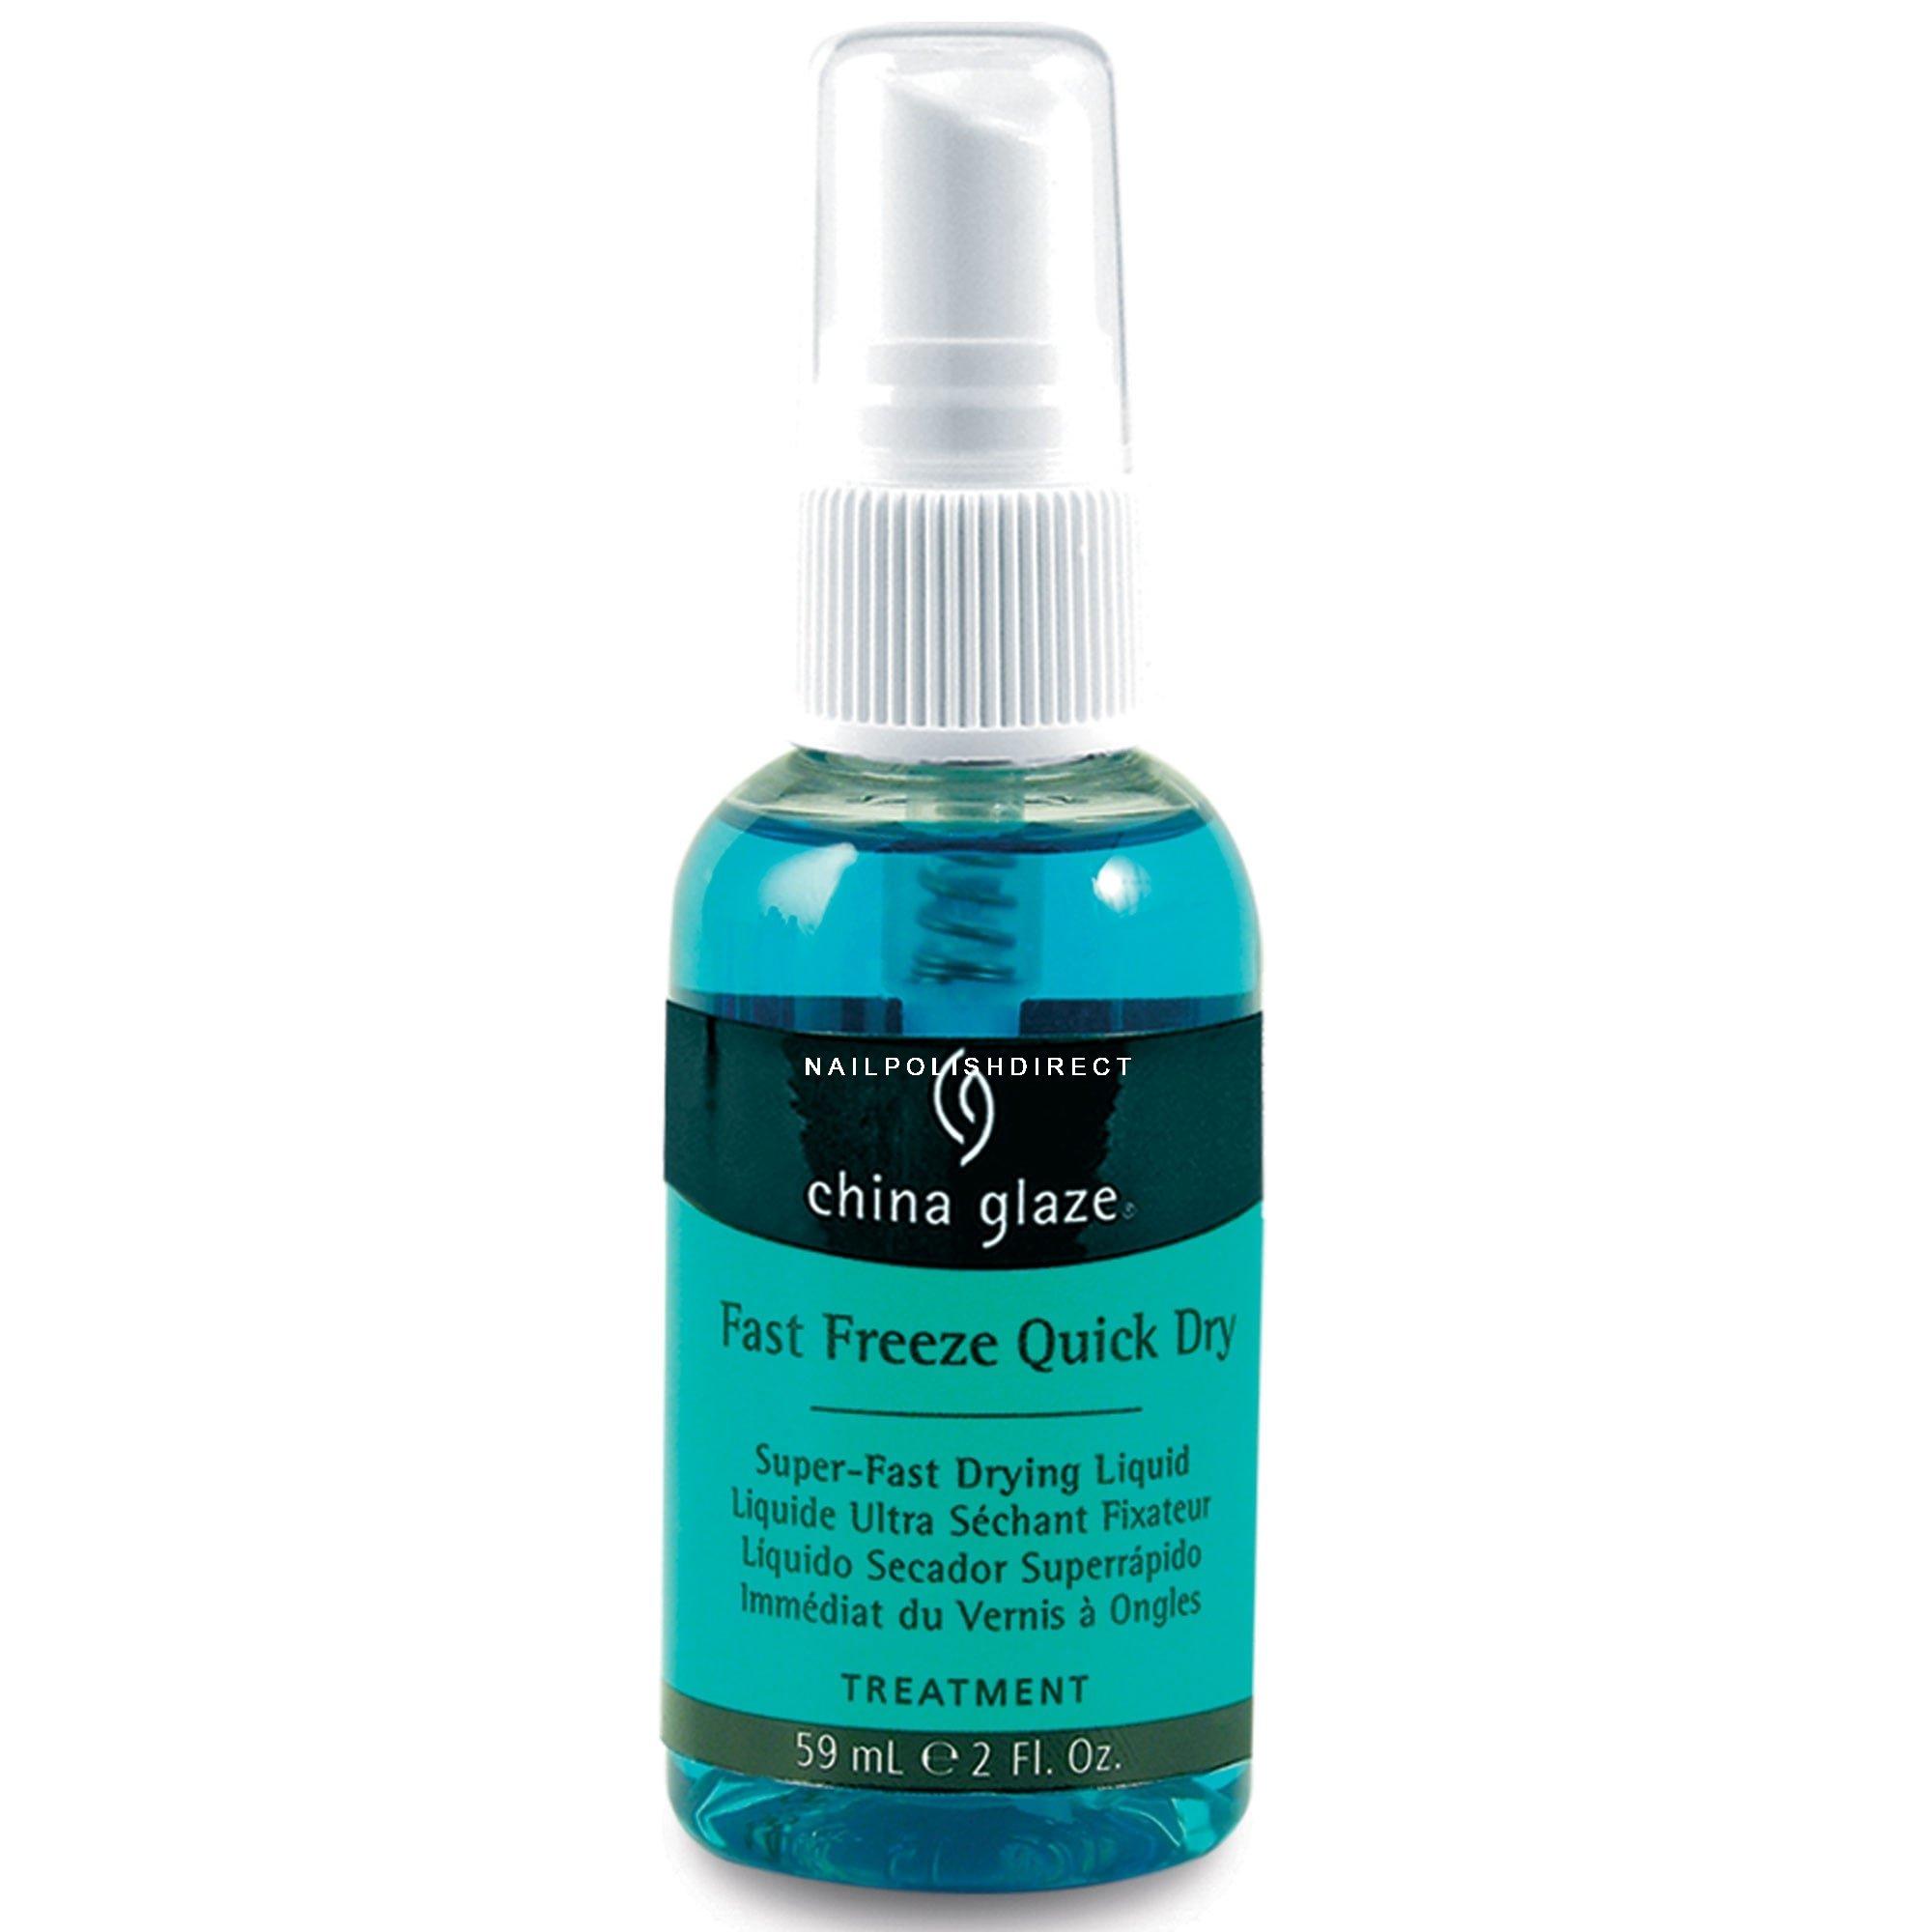 Spray on nail polish china glaze nail spray reviews - Fast Freeze Quick Dry Spray 59ml